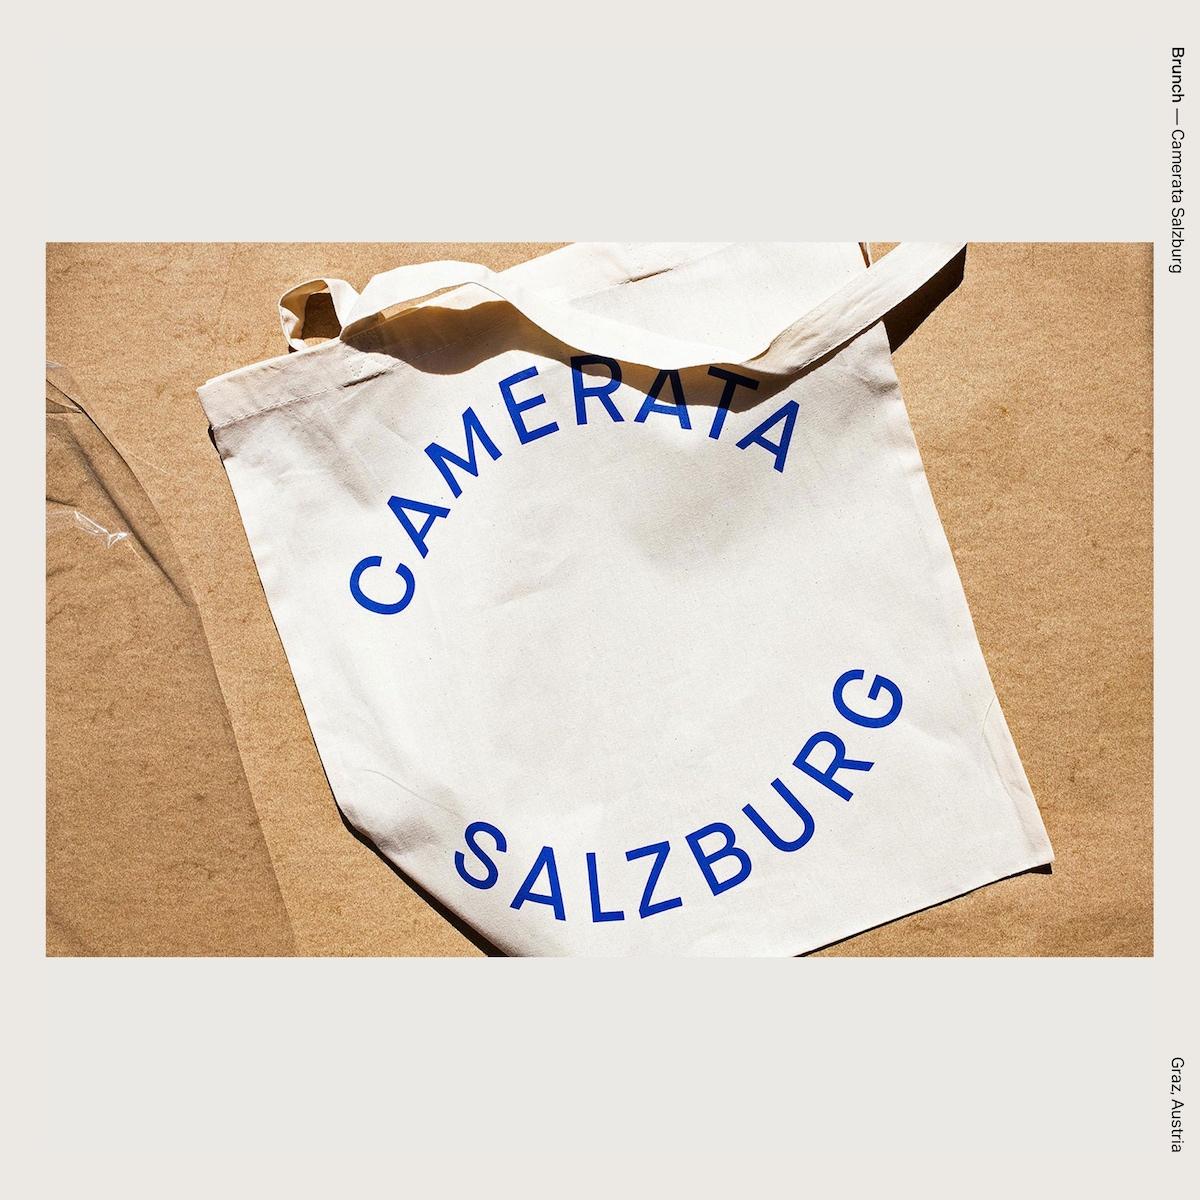 Brunch — Camerata Salzburg